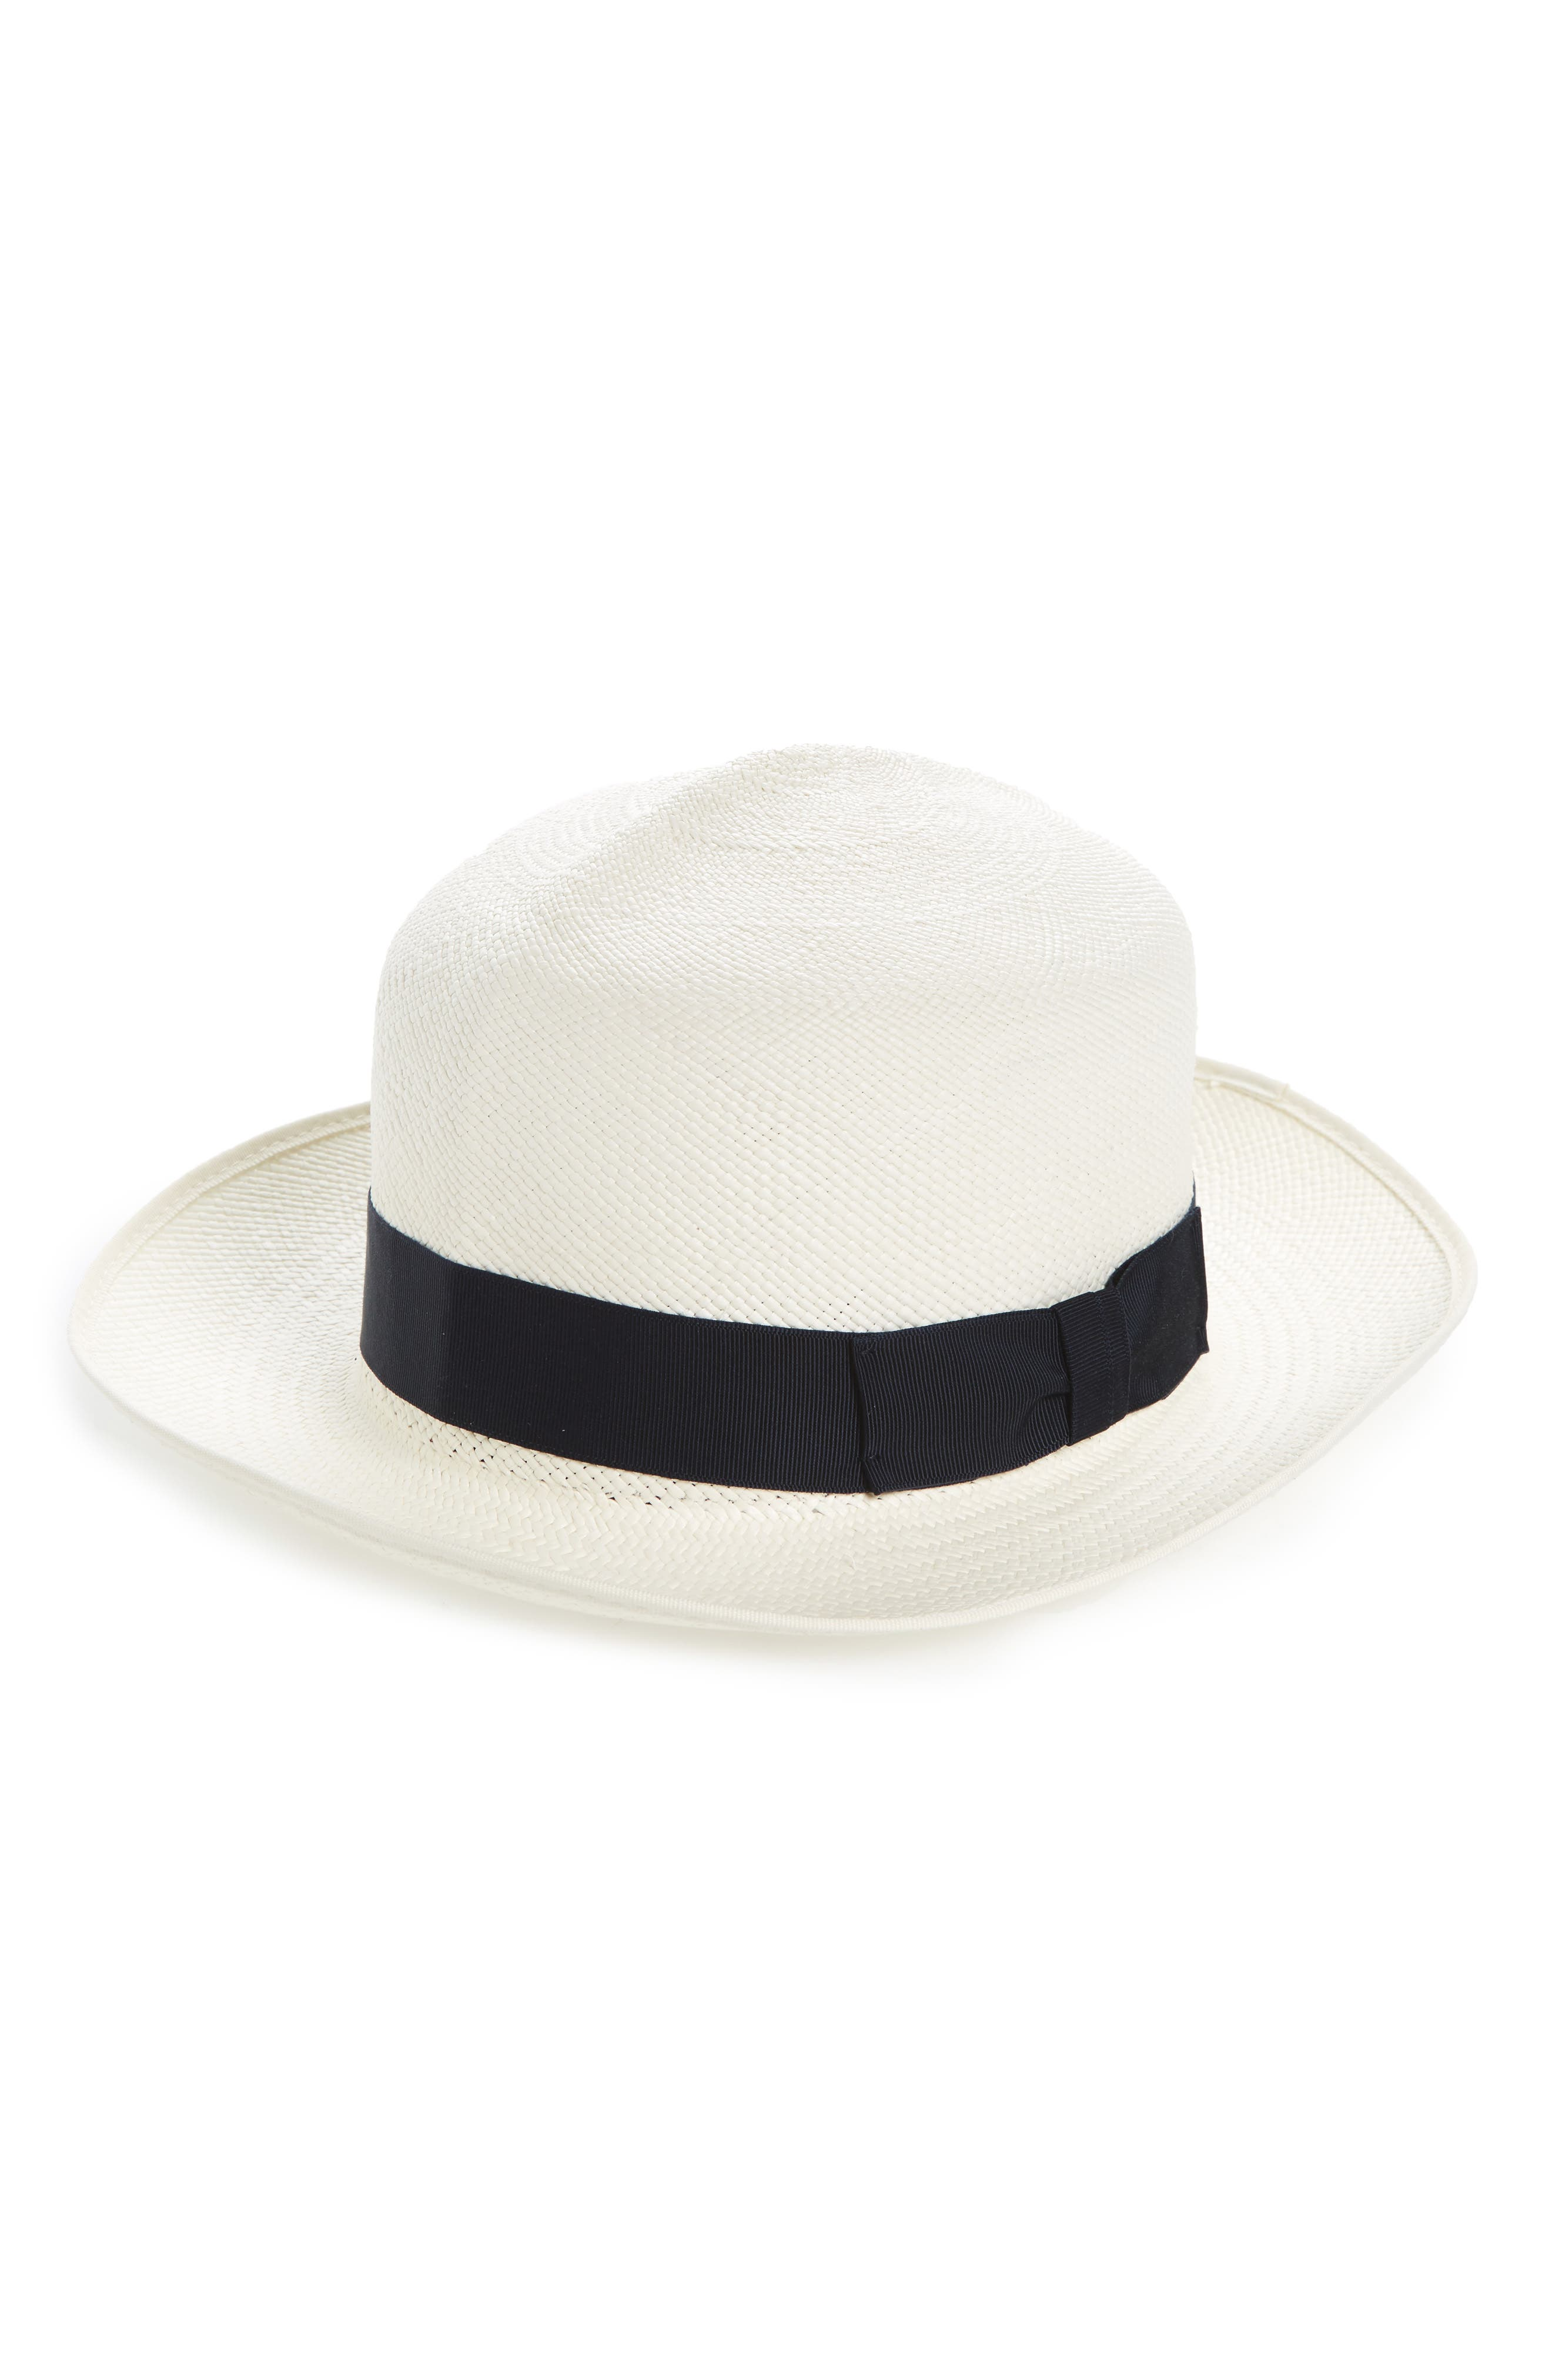 Christy's Hats Folder Straw Panama Hat